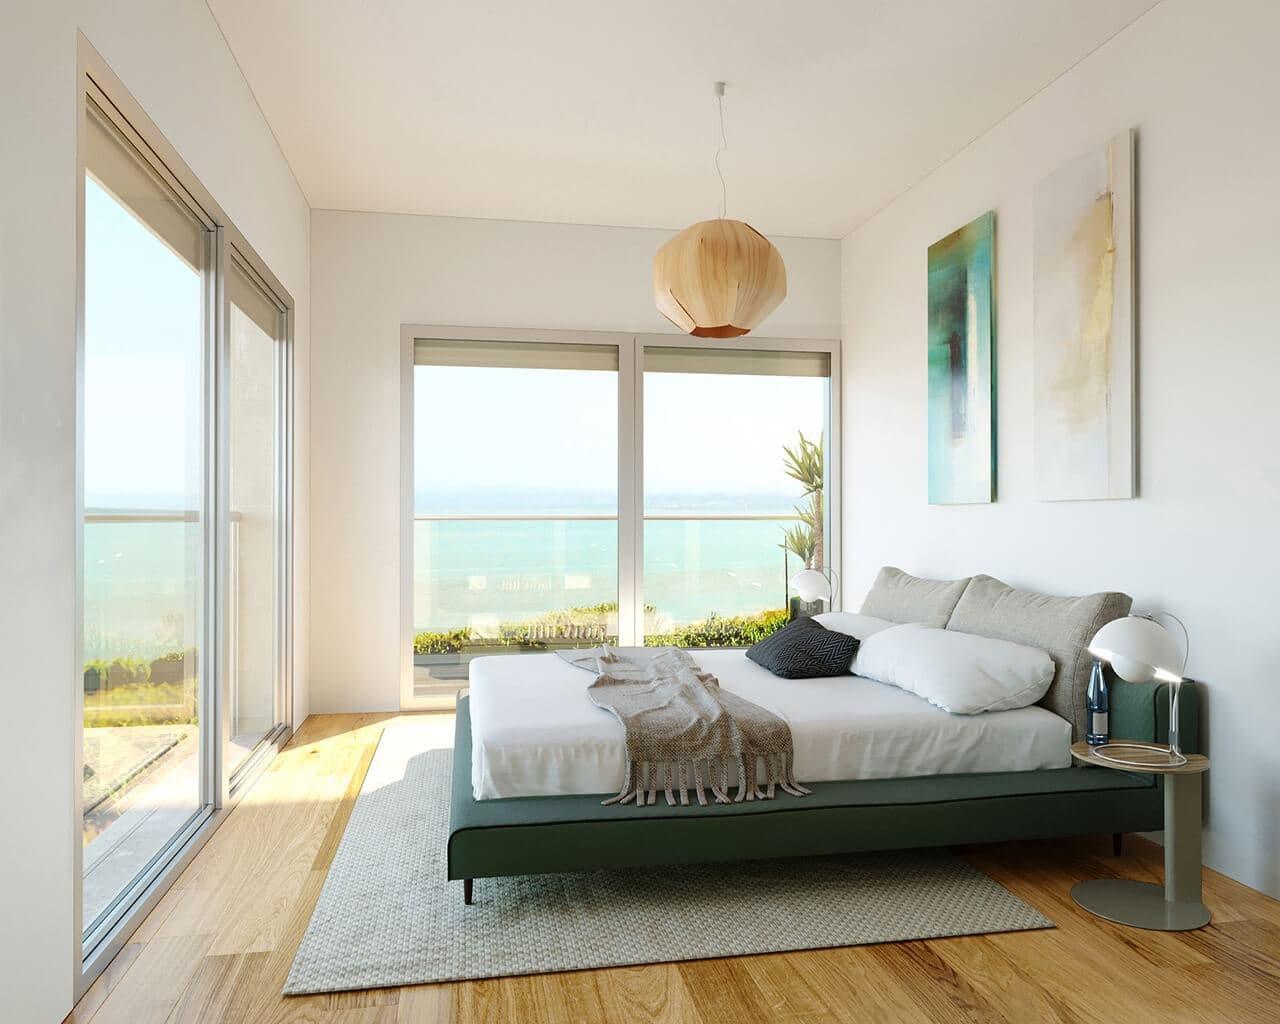 Tagus Bay - Chambre